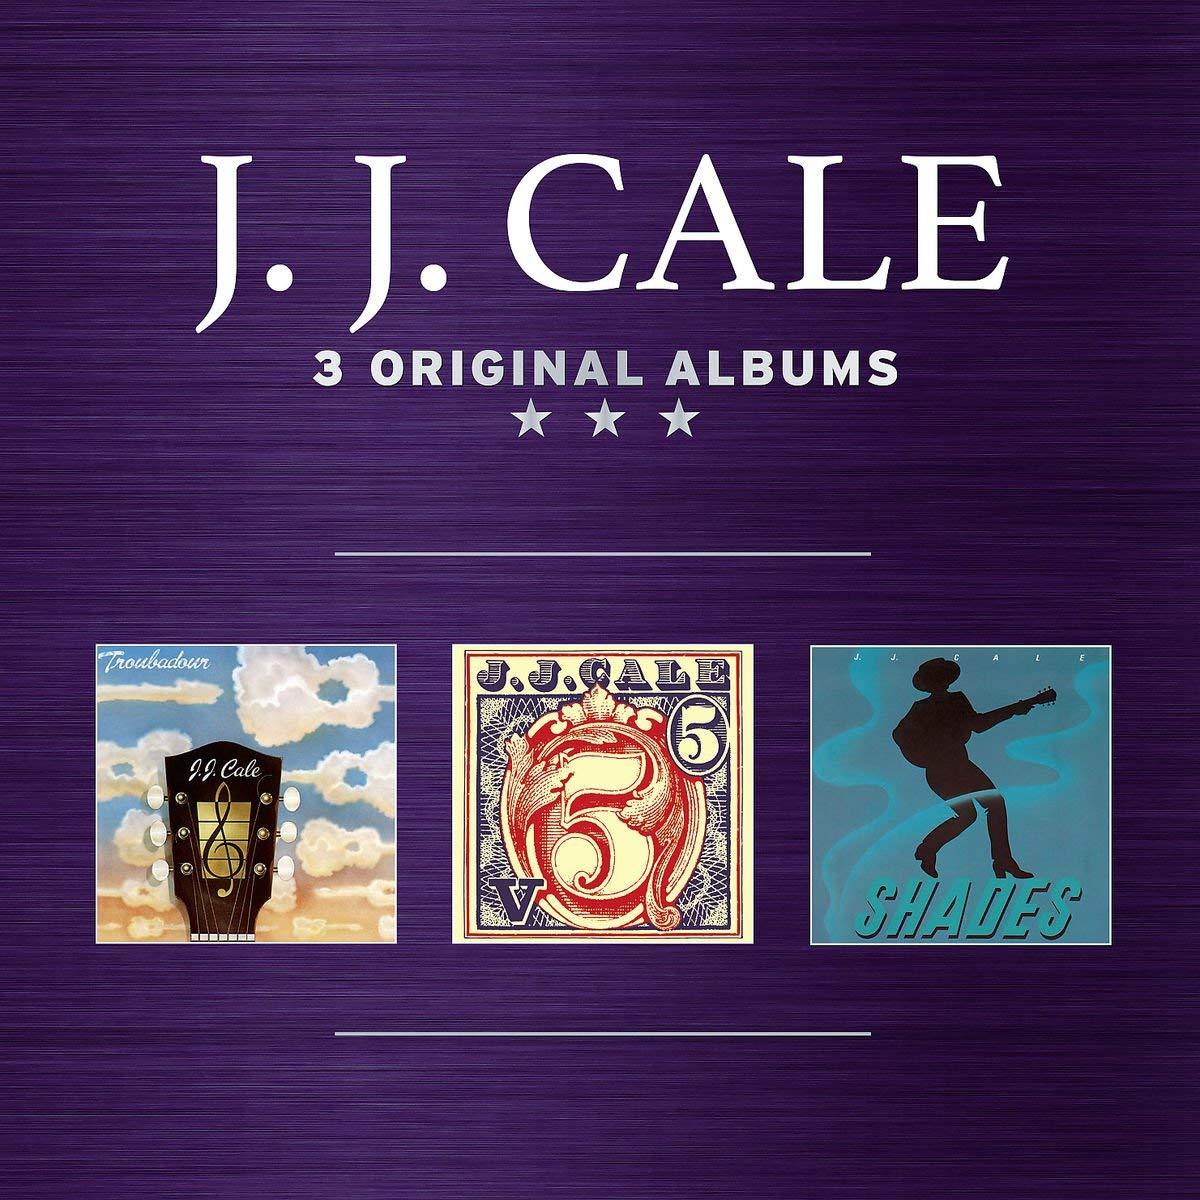 3OriginalAlbums.jpg